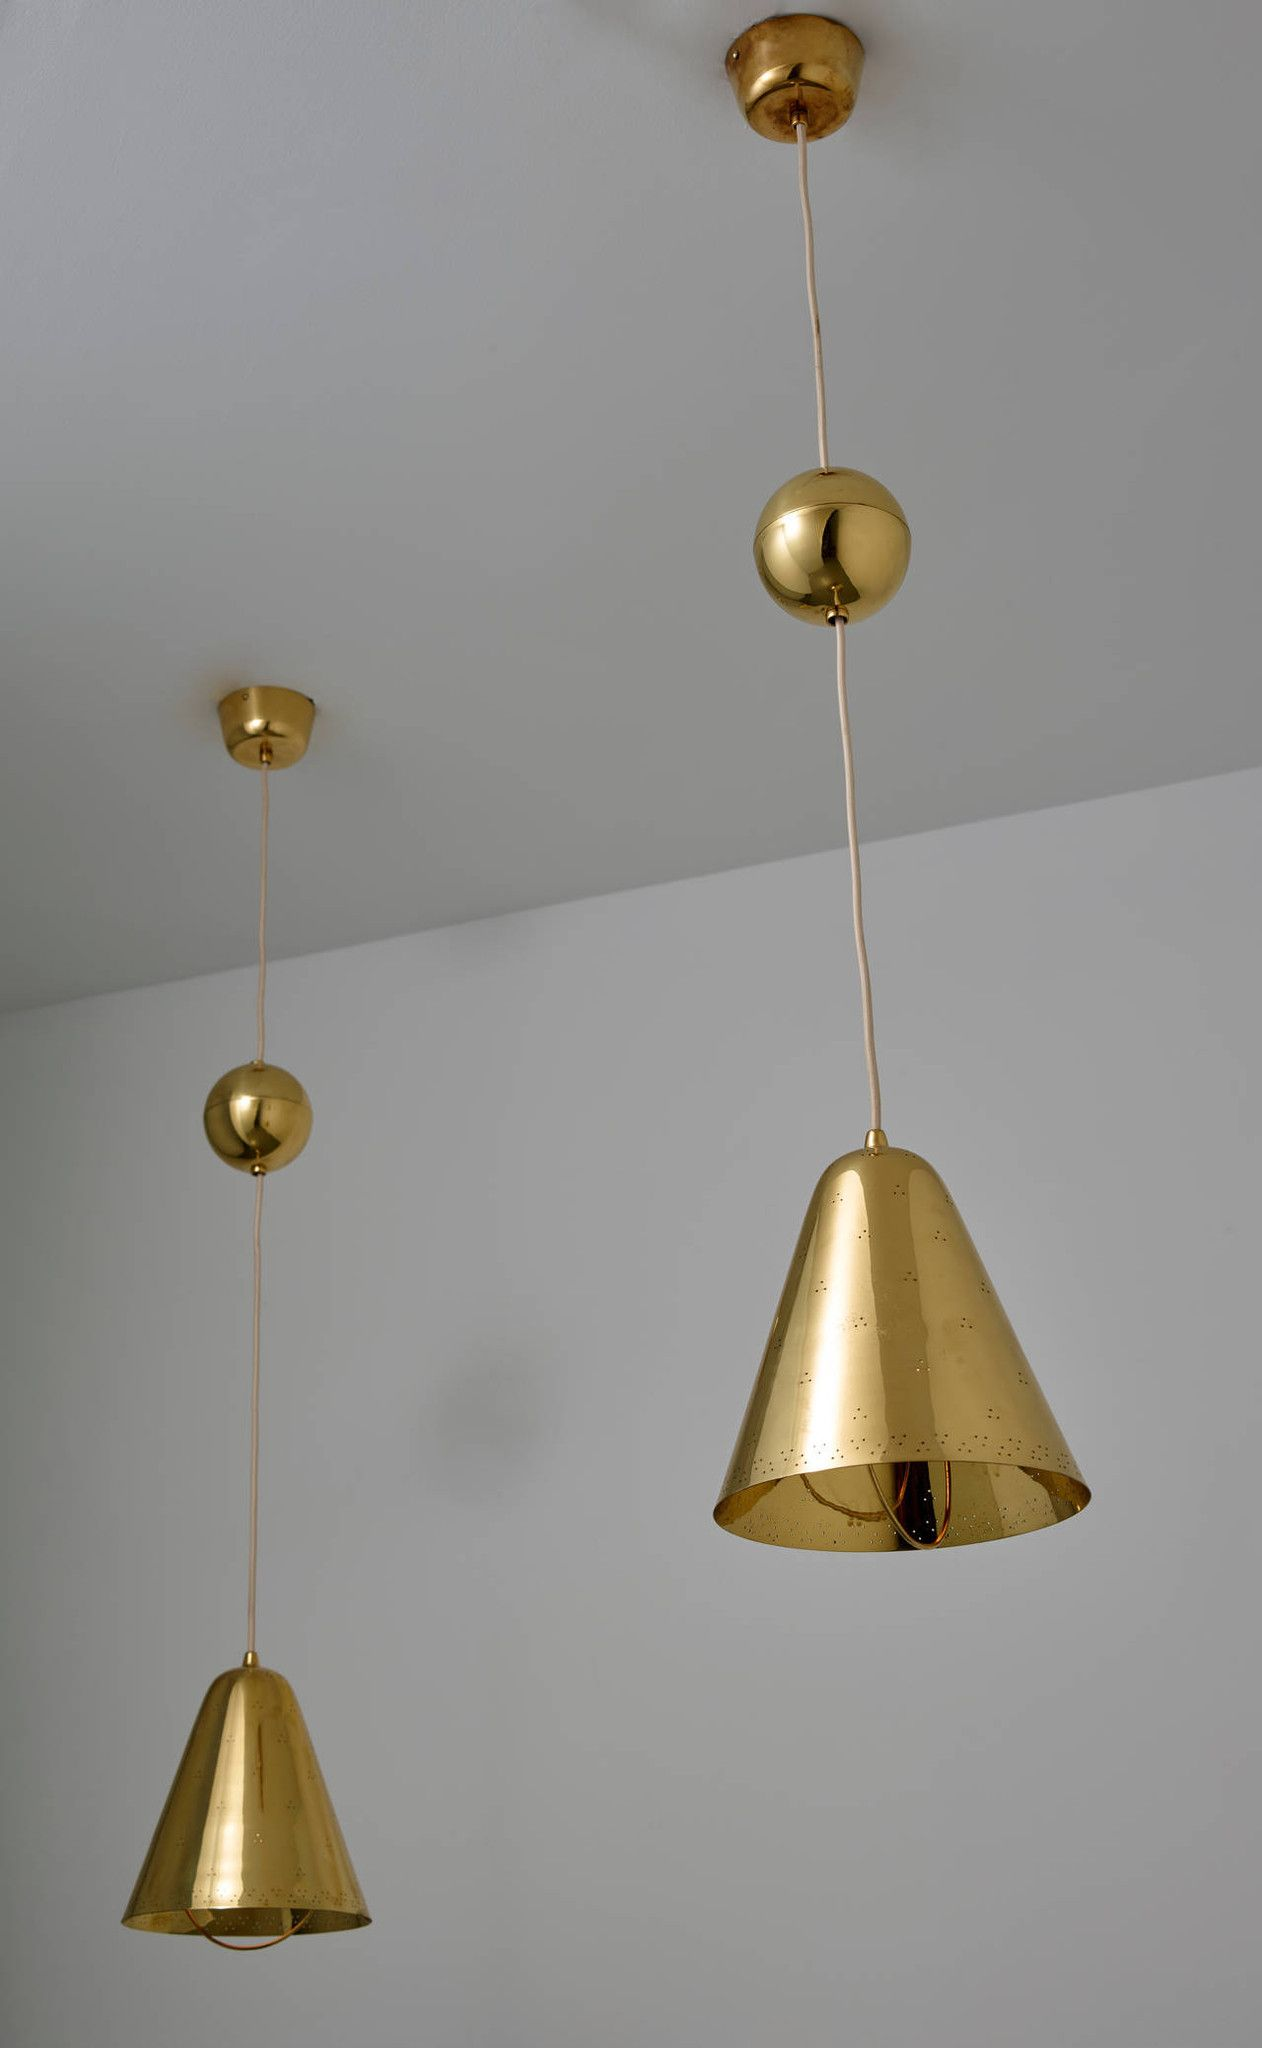 Paavo Tynell Adjustable Pendant Lights Pair By Taito Oy 1950s Adjustable Pendant Light Pendant Lighting Adjustable Pendant